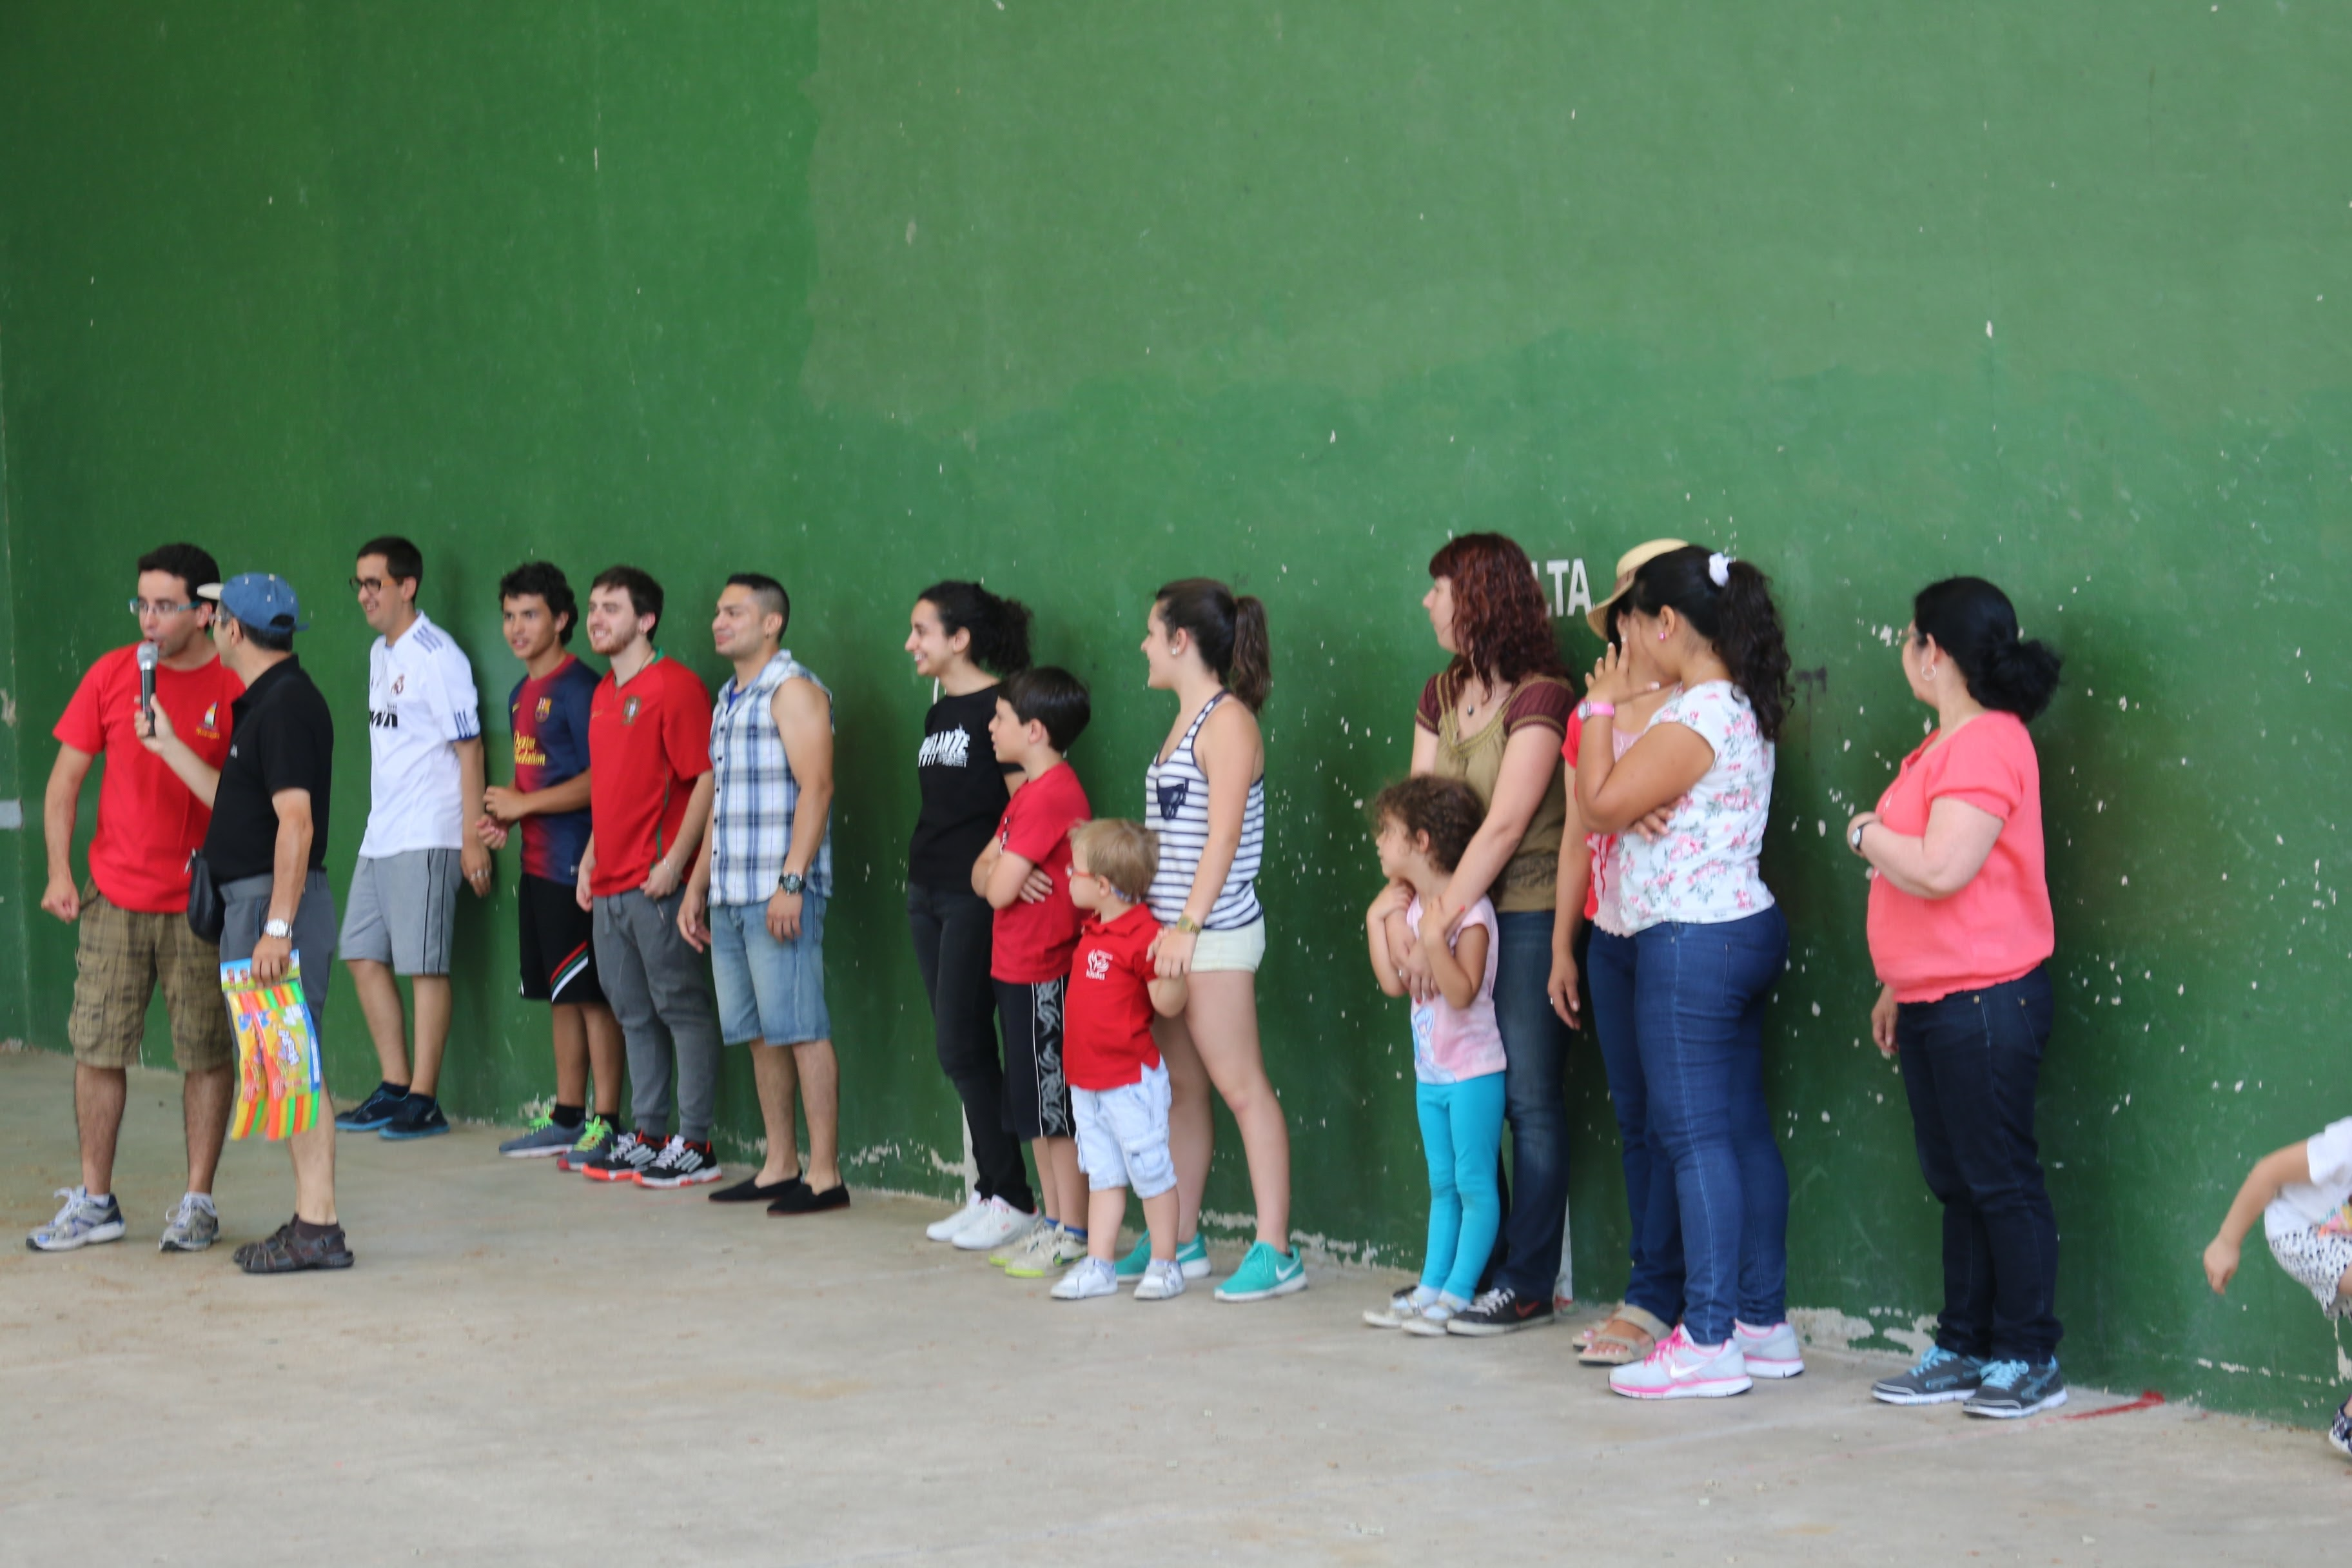 Picasa - Día de Campo SdJ 05.07.2015 (33).jpg